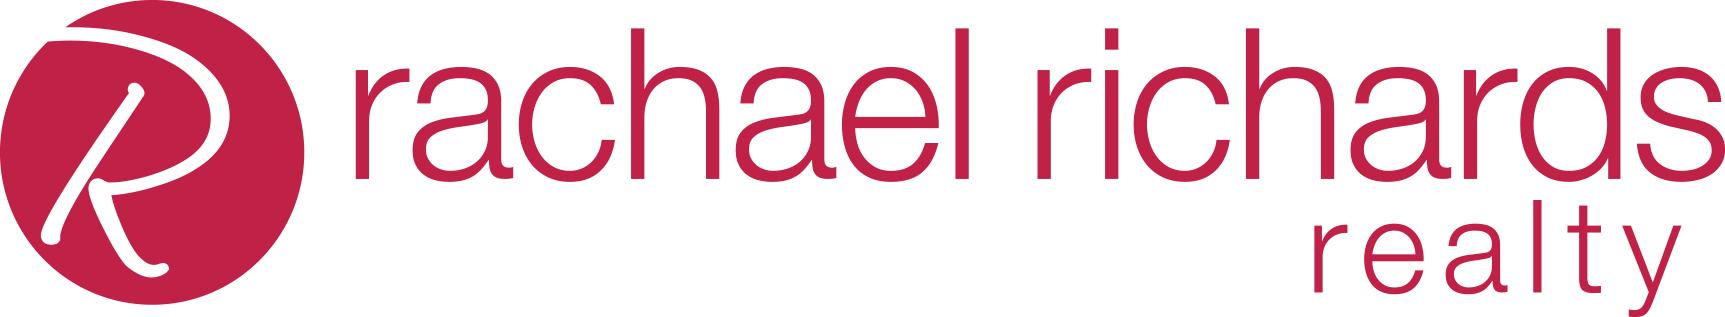 Rachael Richards Realty logo